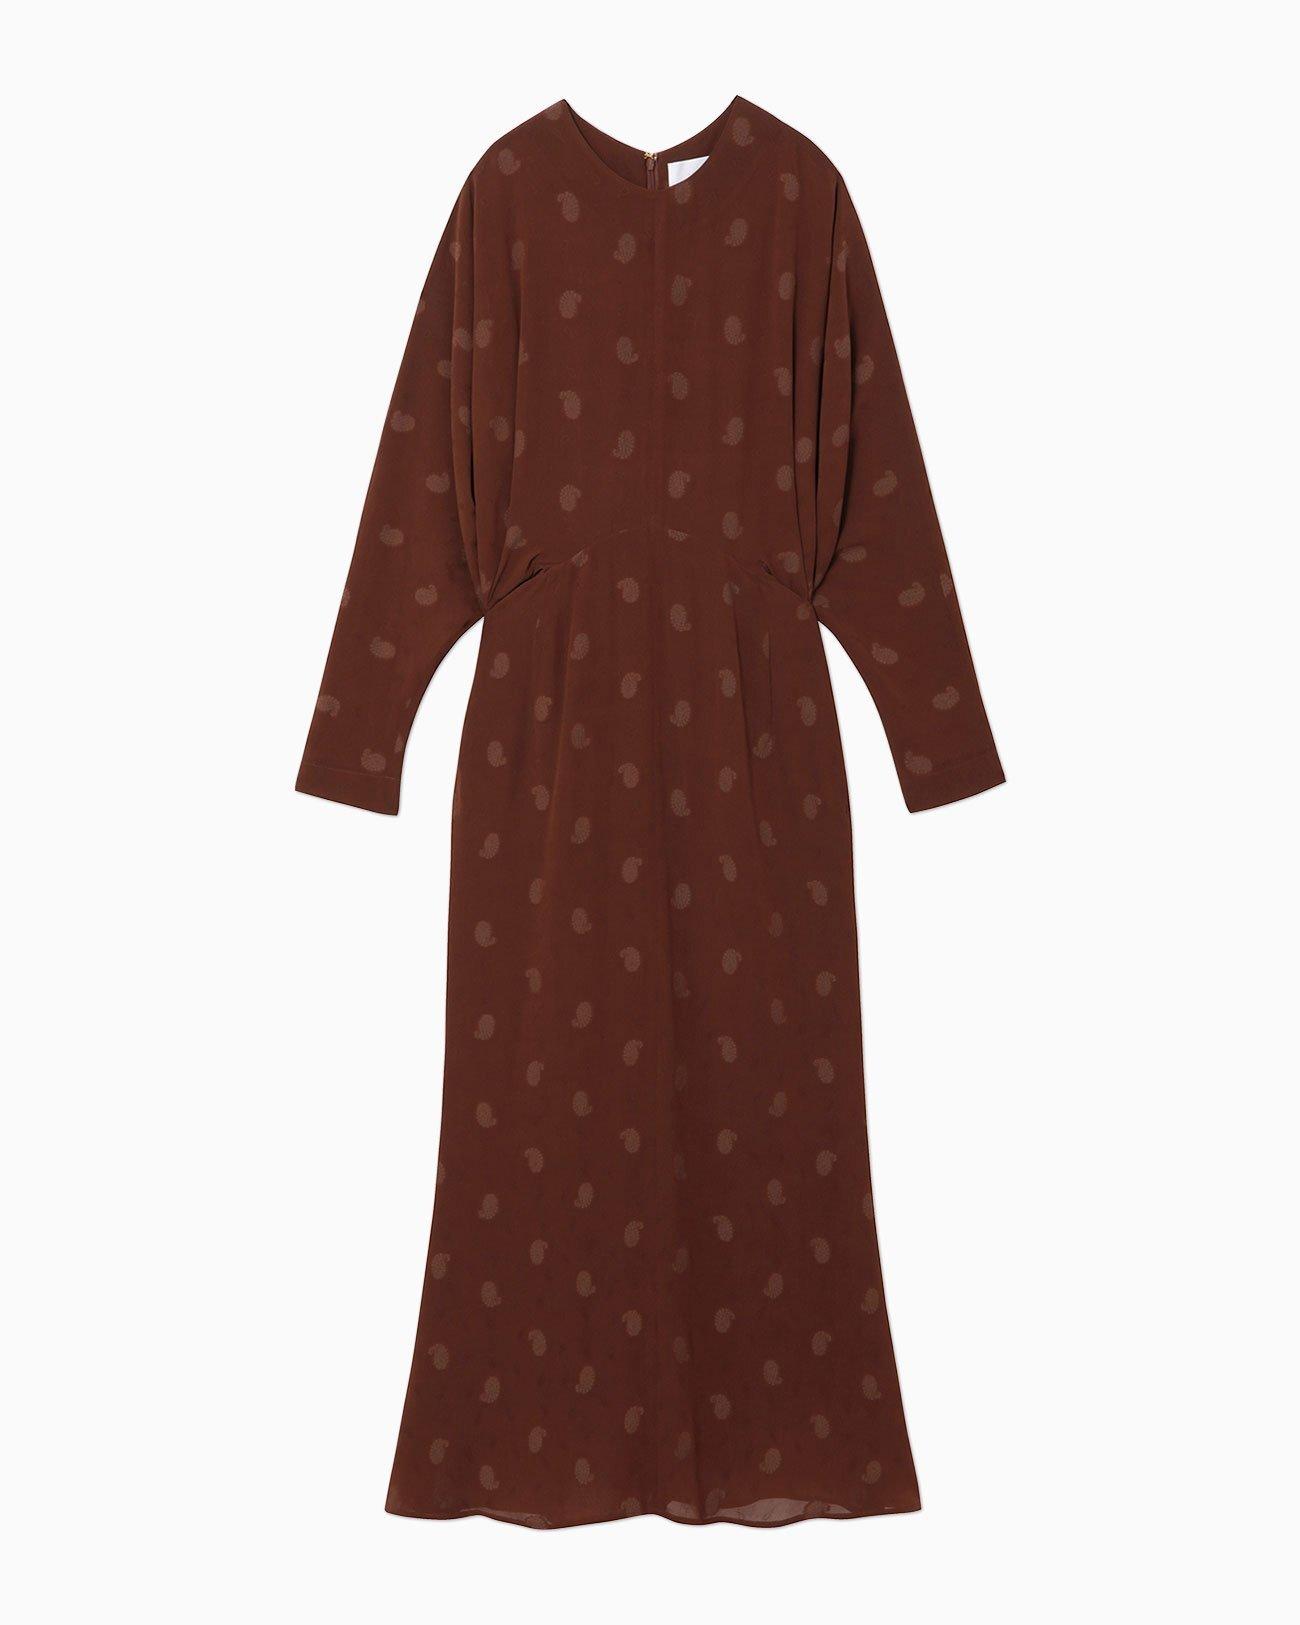 【Mame Kurogouchi】Paisley Jacquard Classic Dress MM21PF-DR708